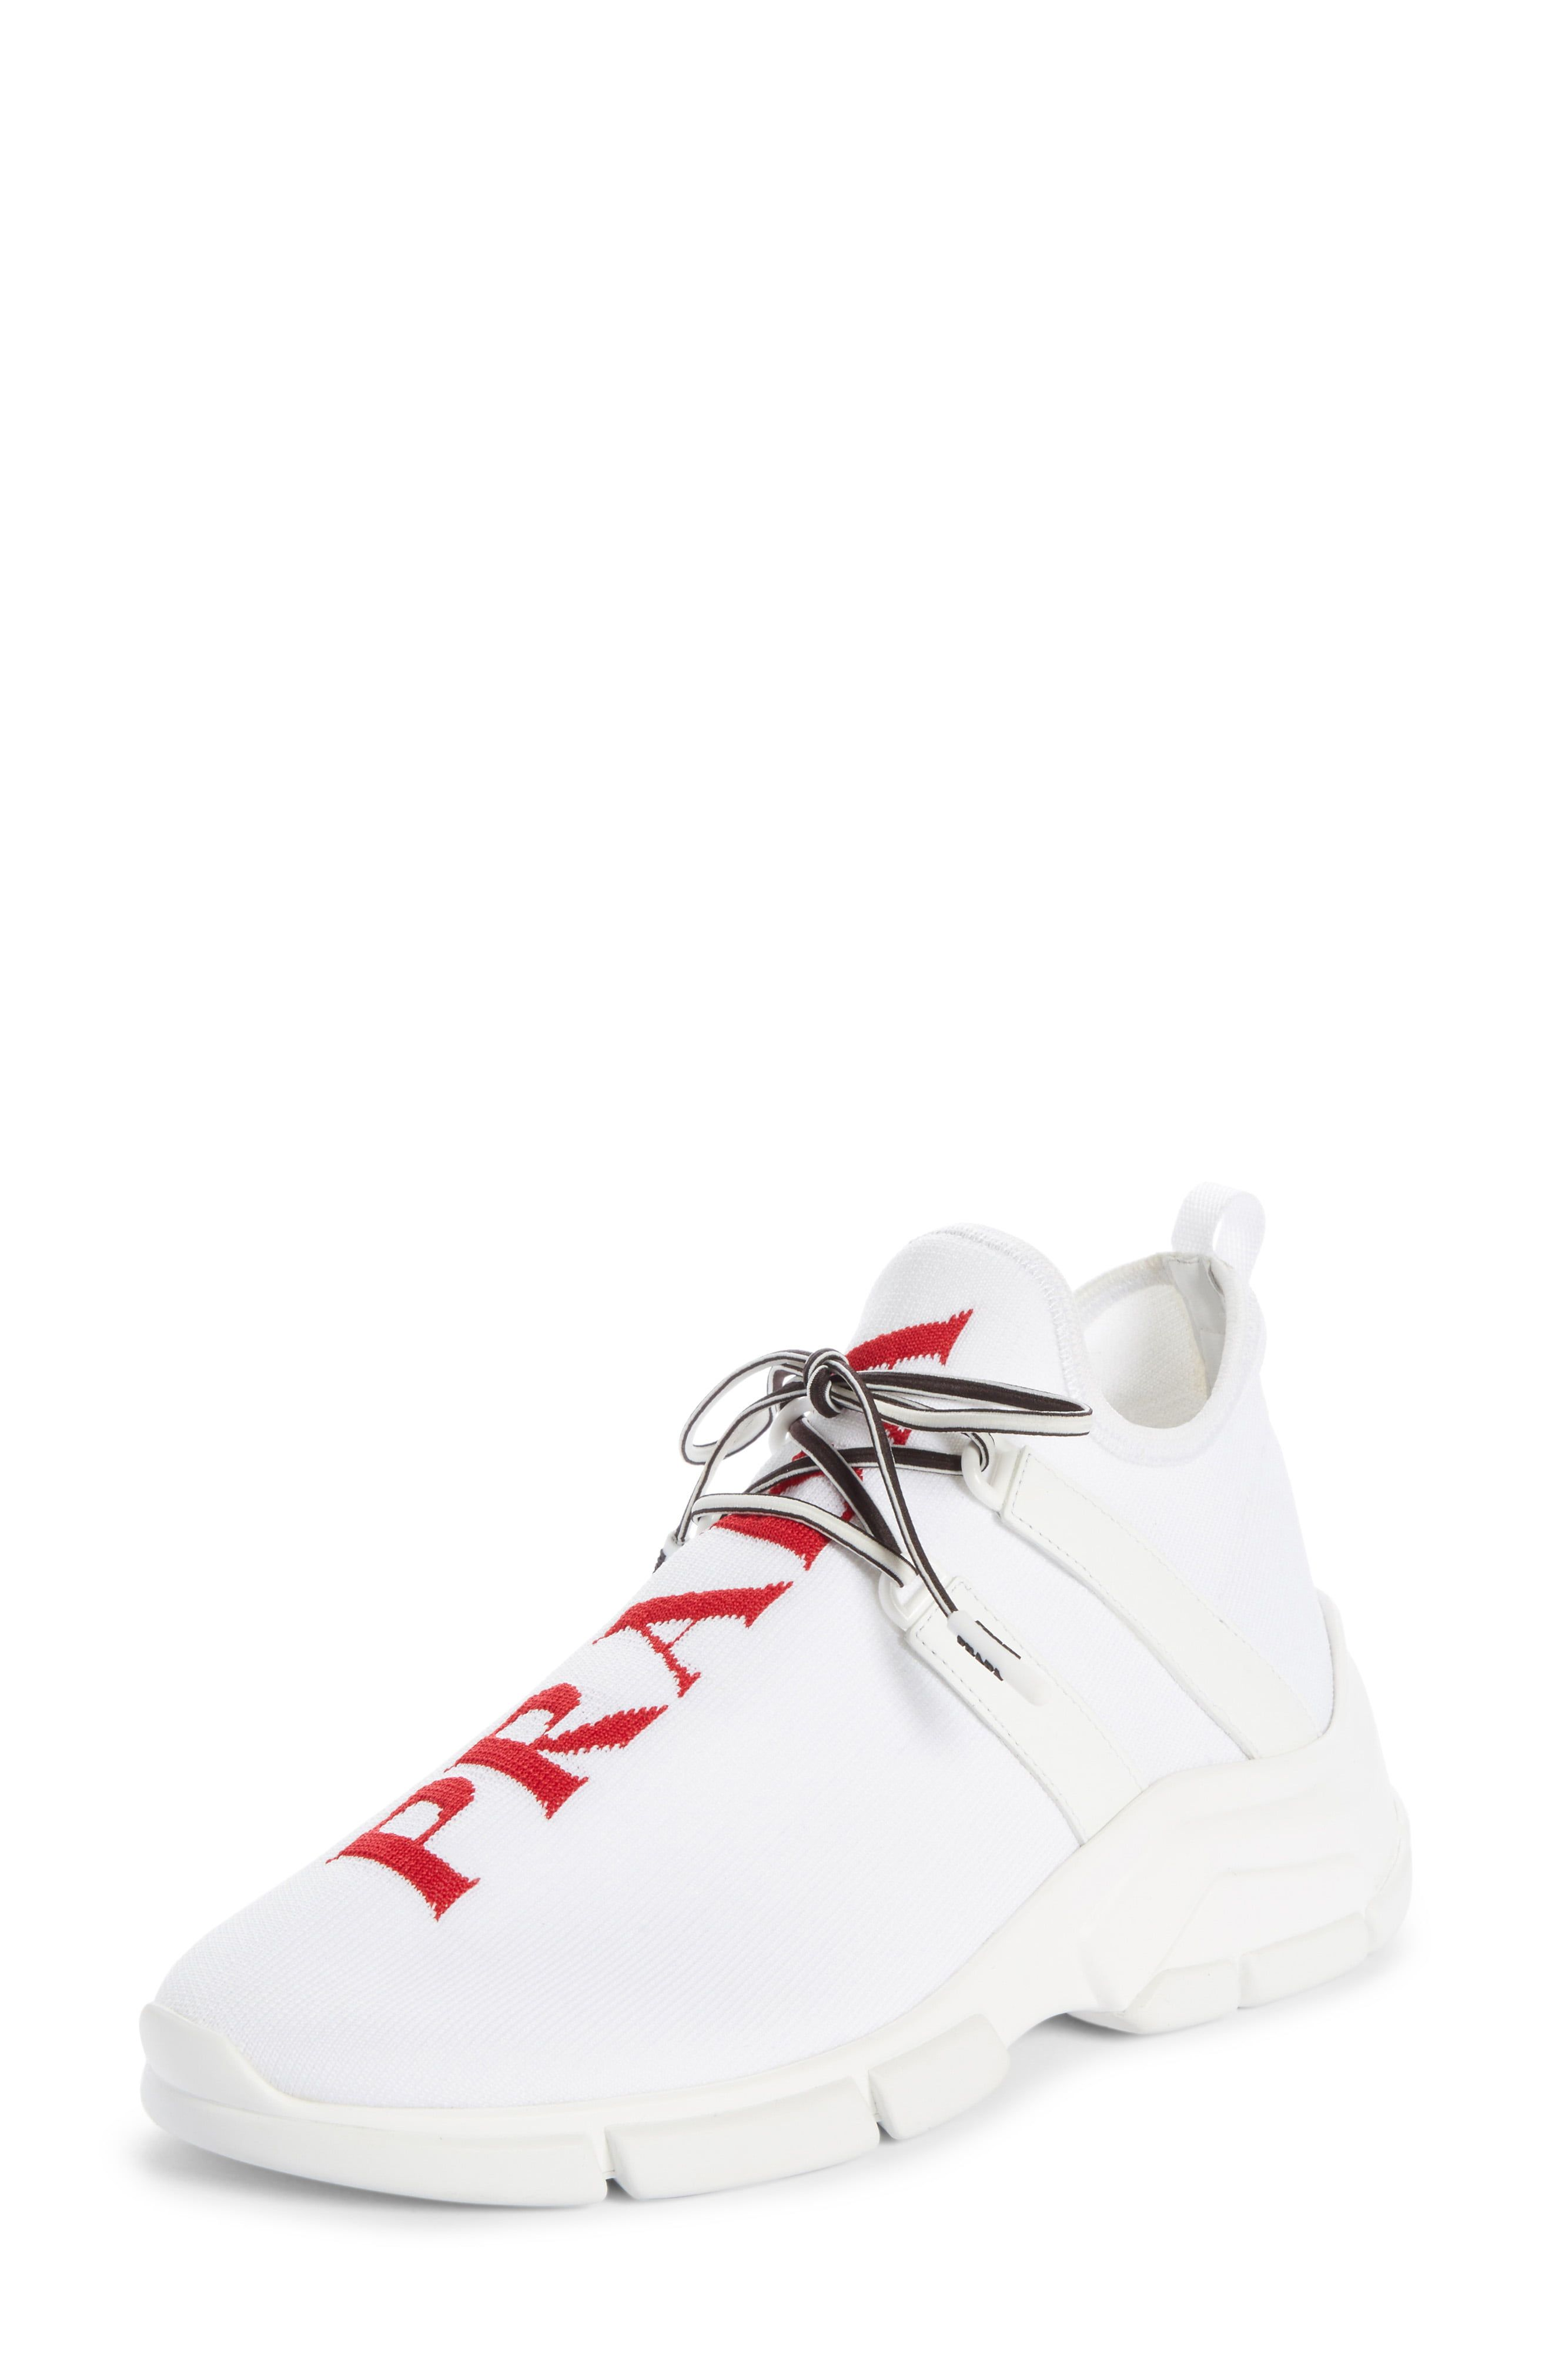 Women's Prada Knit Sock Sneaker, Size 6US 36EU Black